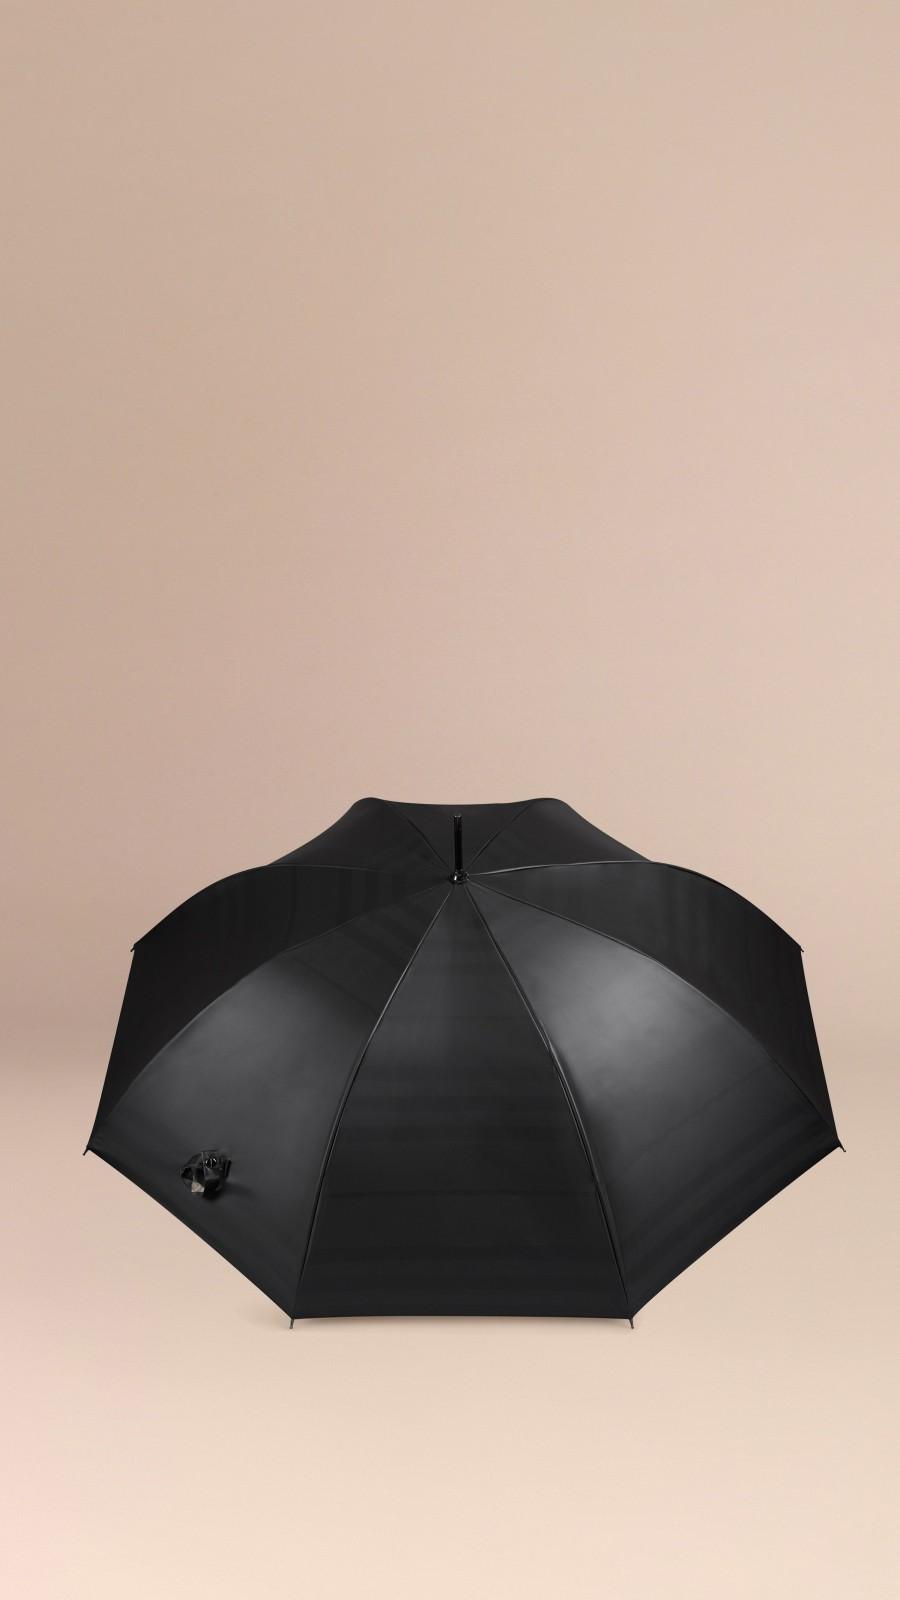 Black camel check Check-Lined Walking Umbrella Black Camel - Image 2